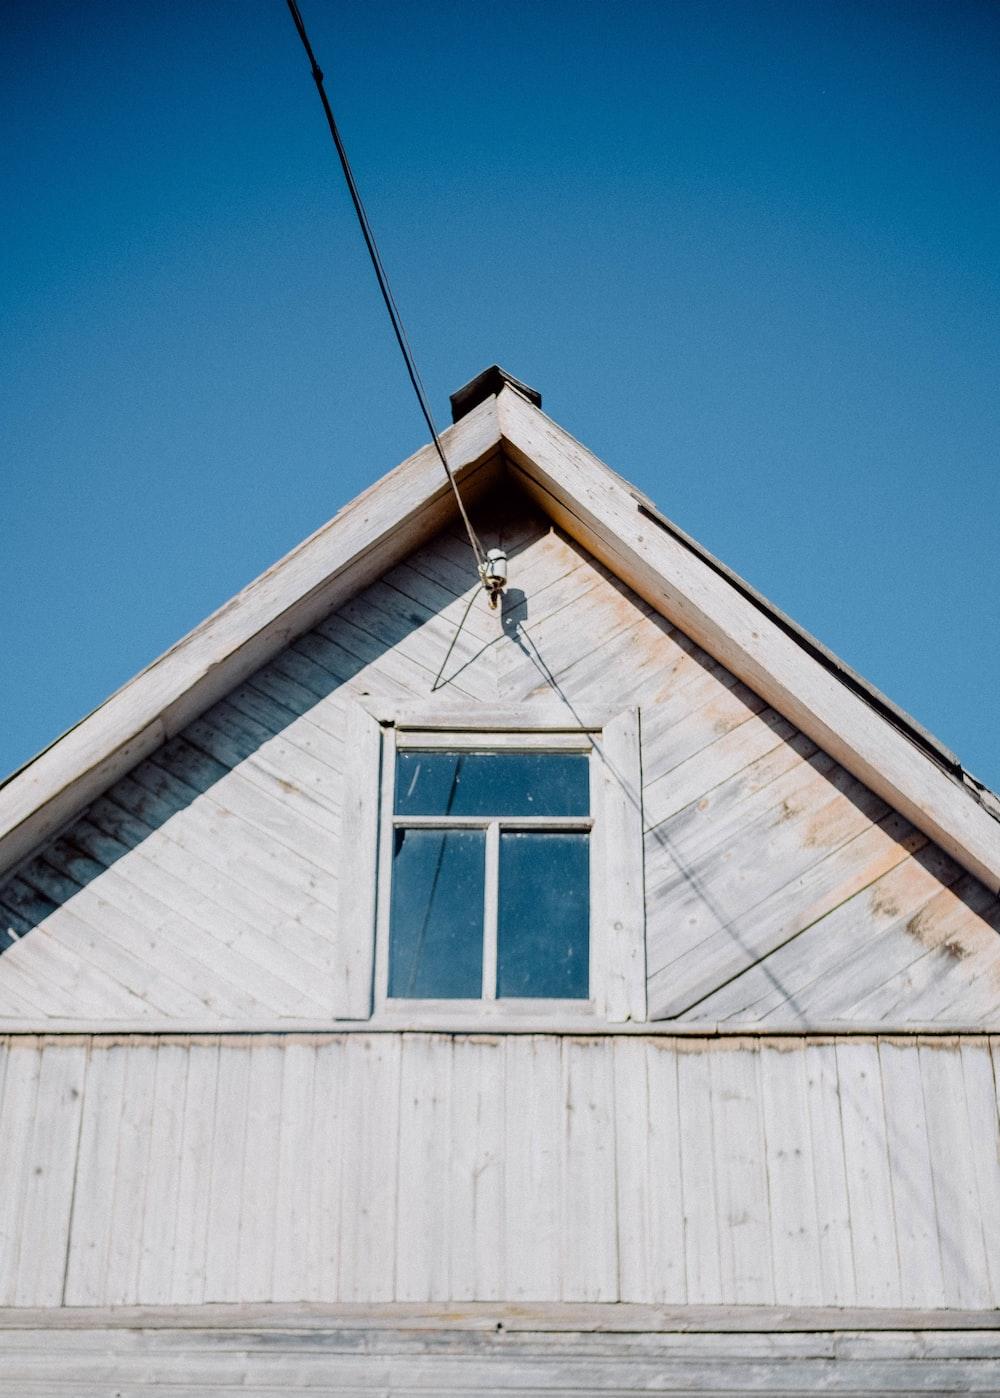 white wooden house under blue sky during daytime